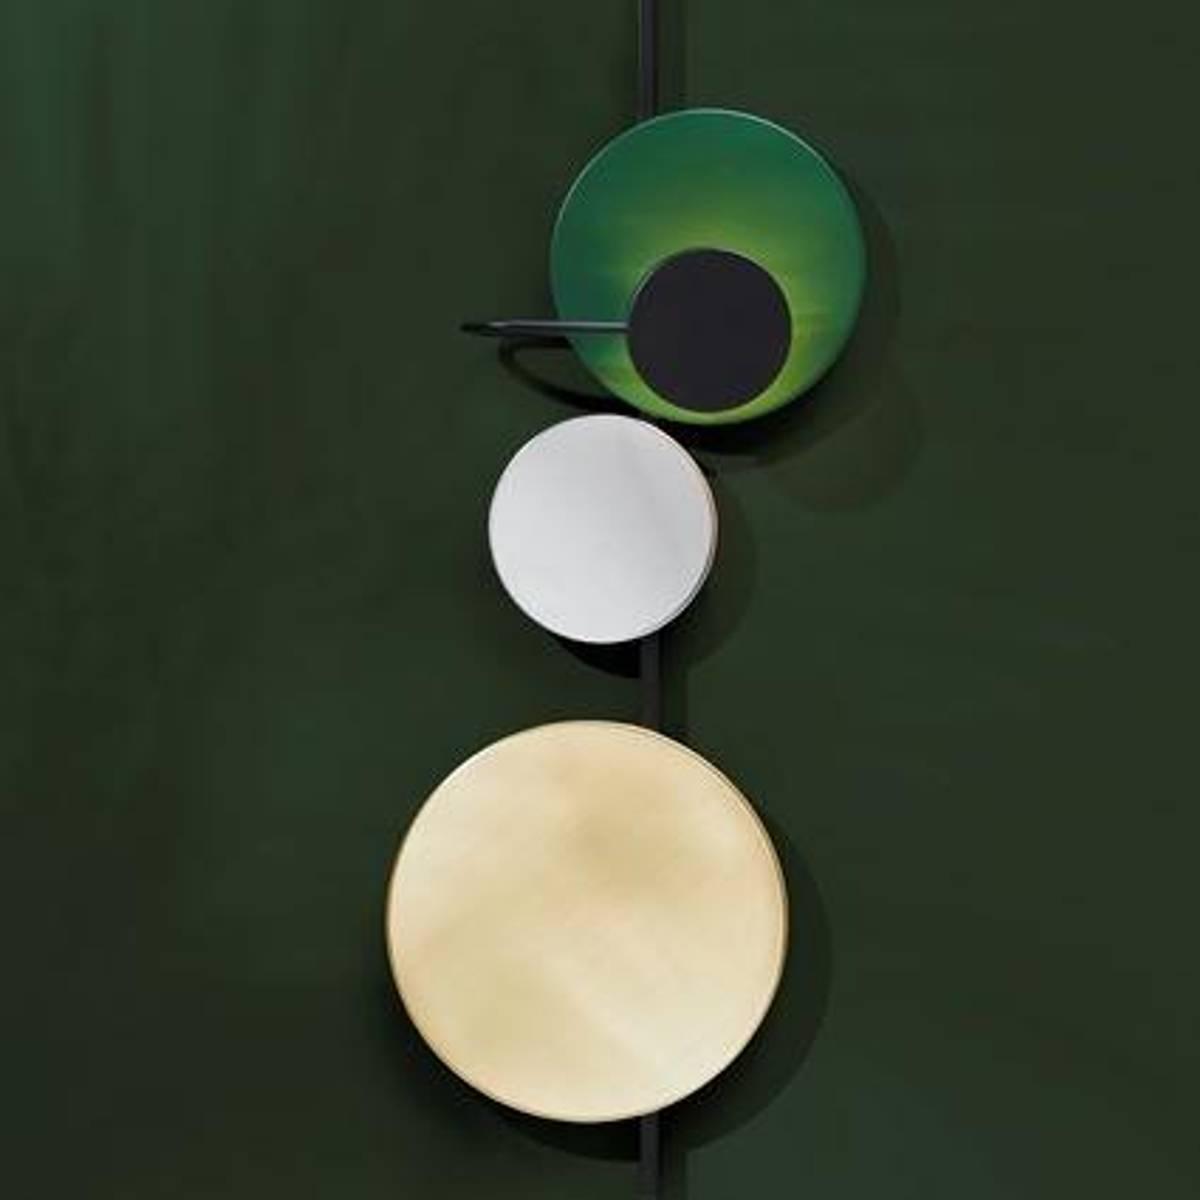 Planet Vegglampe Cedar Green, PWtbS